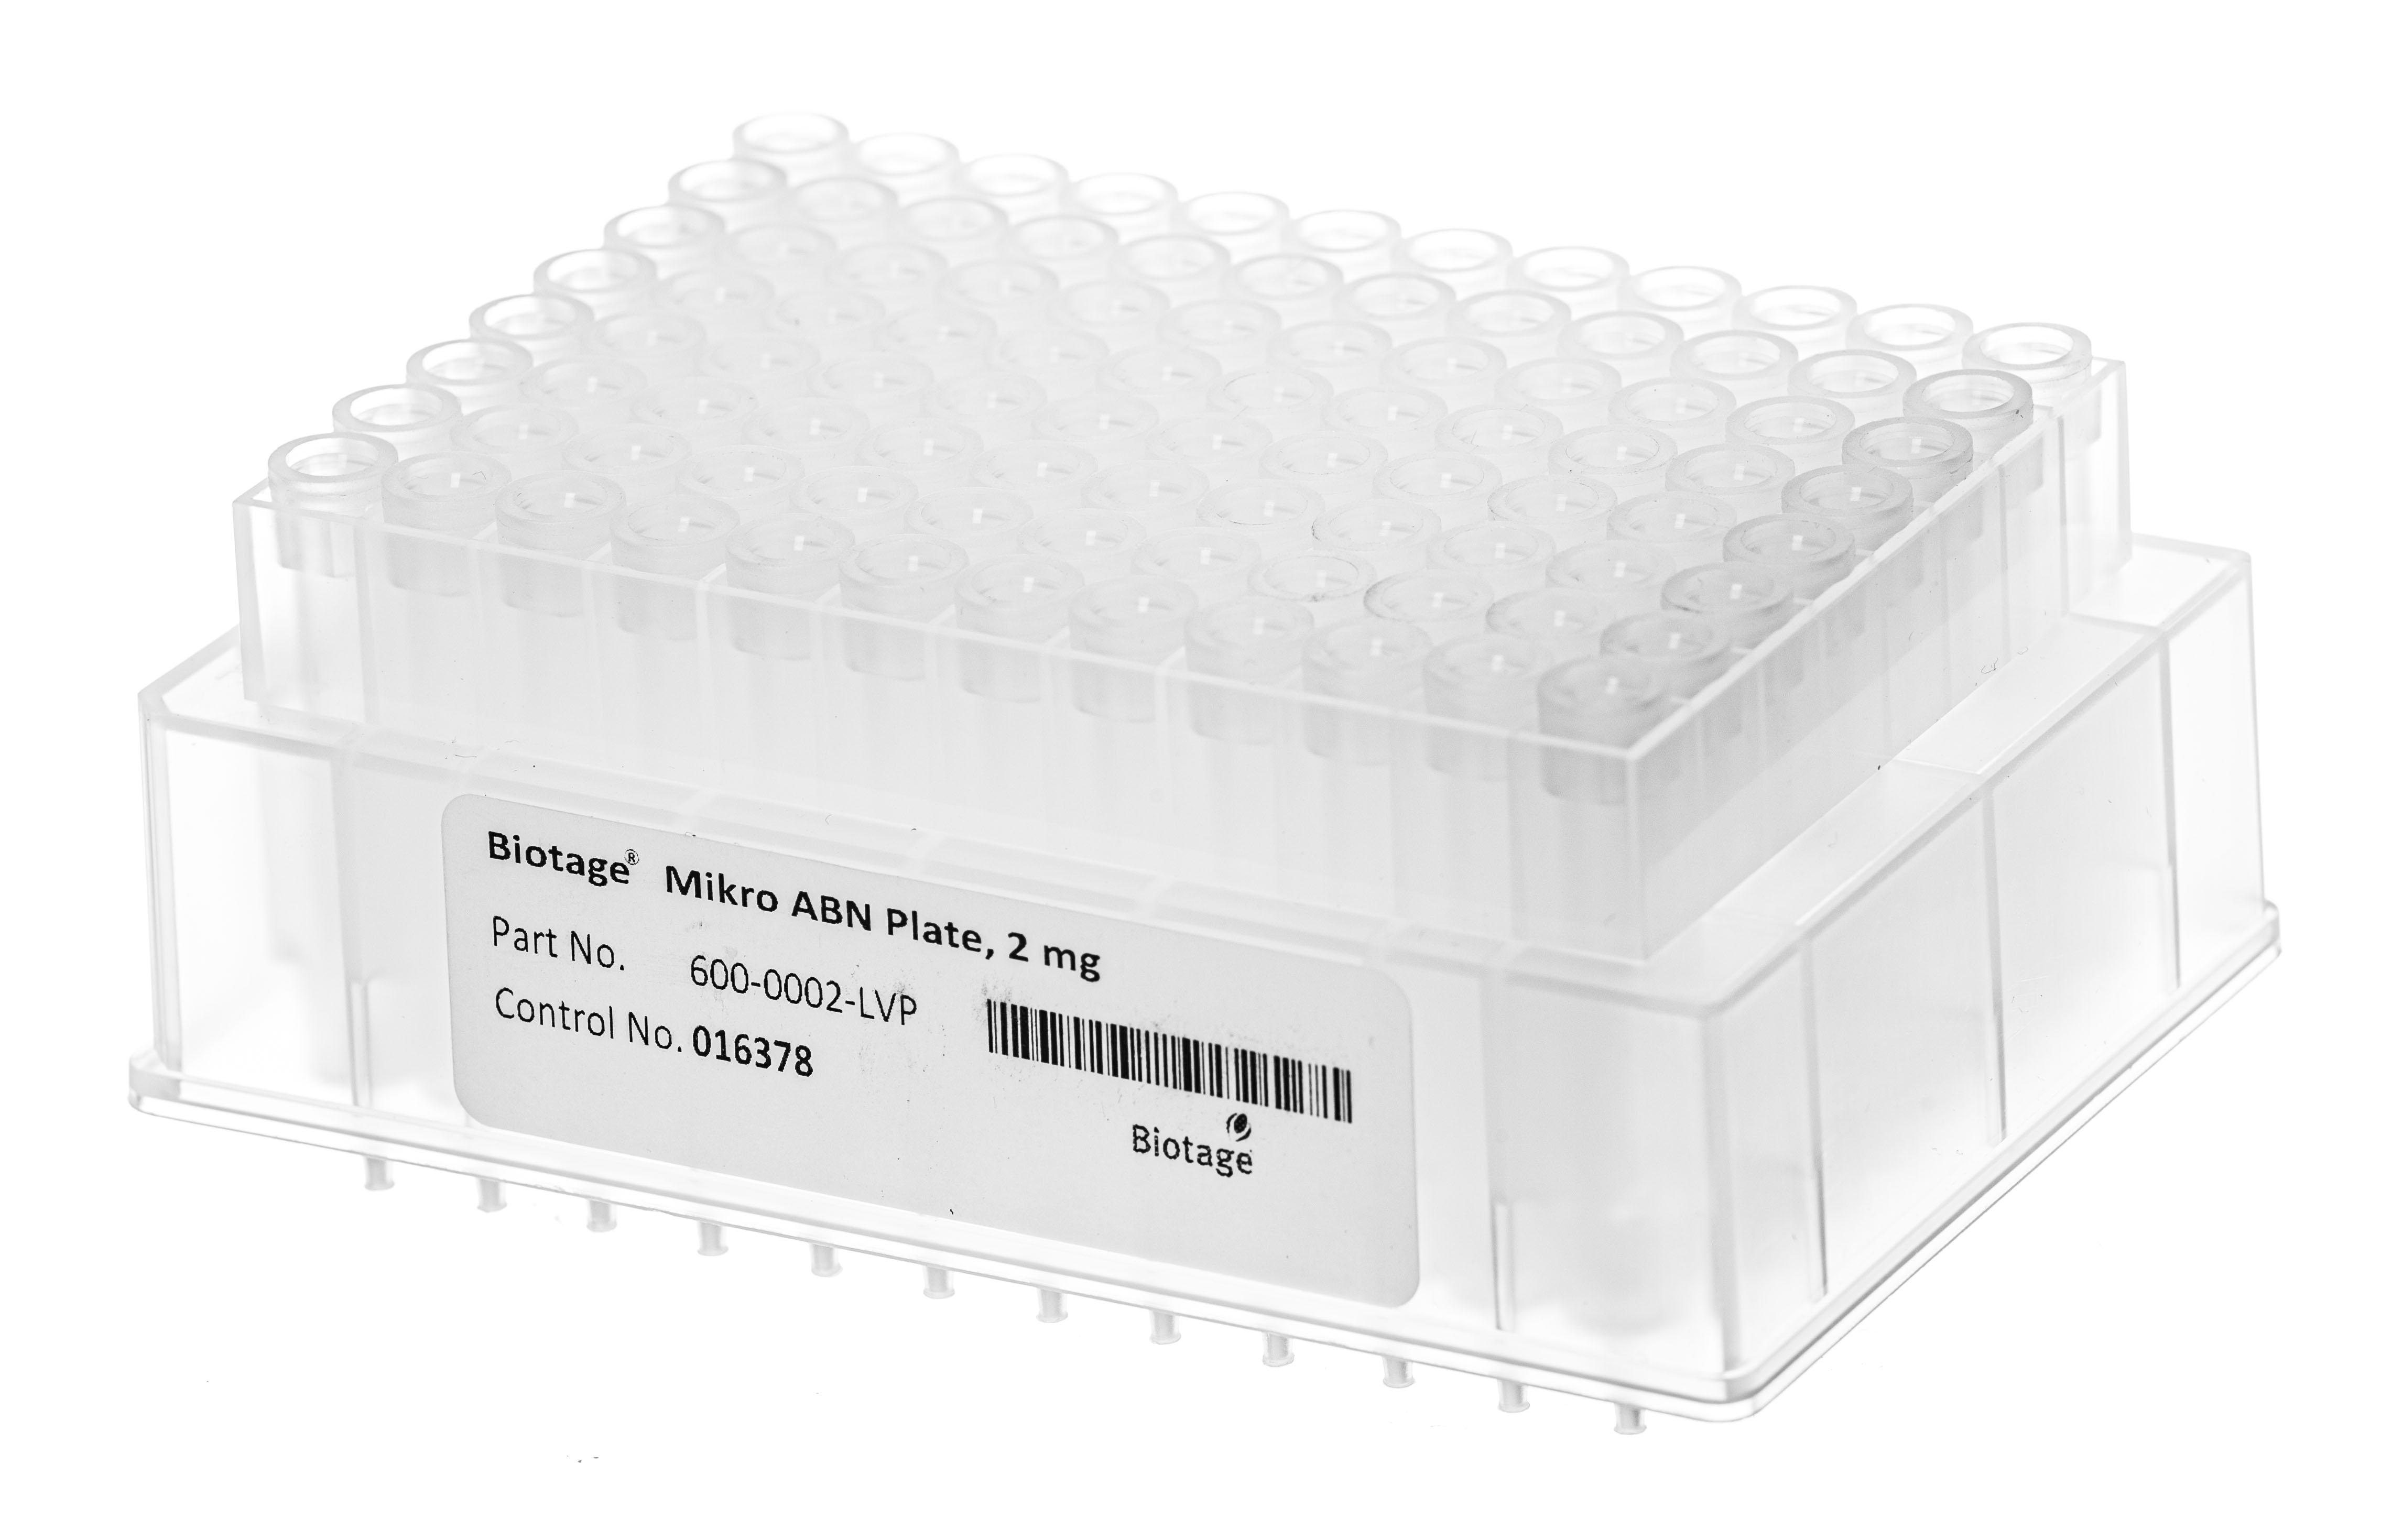 Biotage Mikro plate 600-002-LVPb